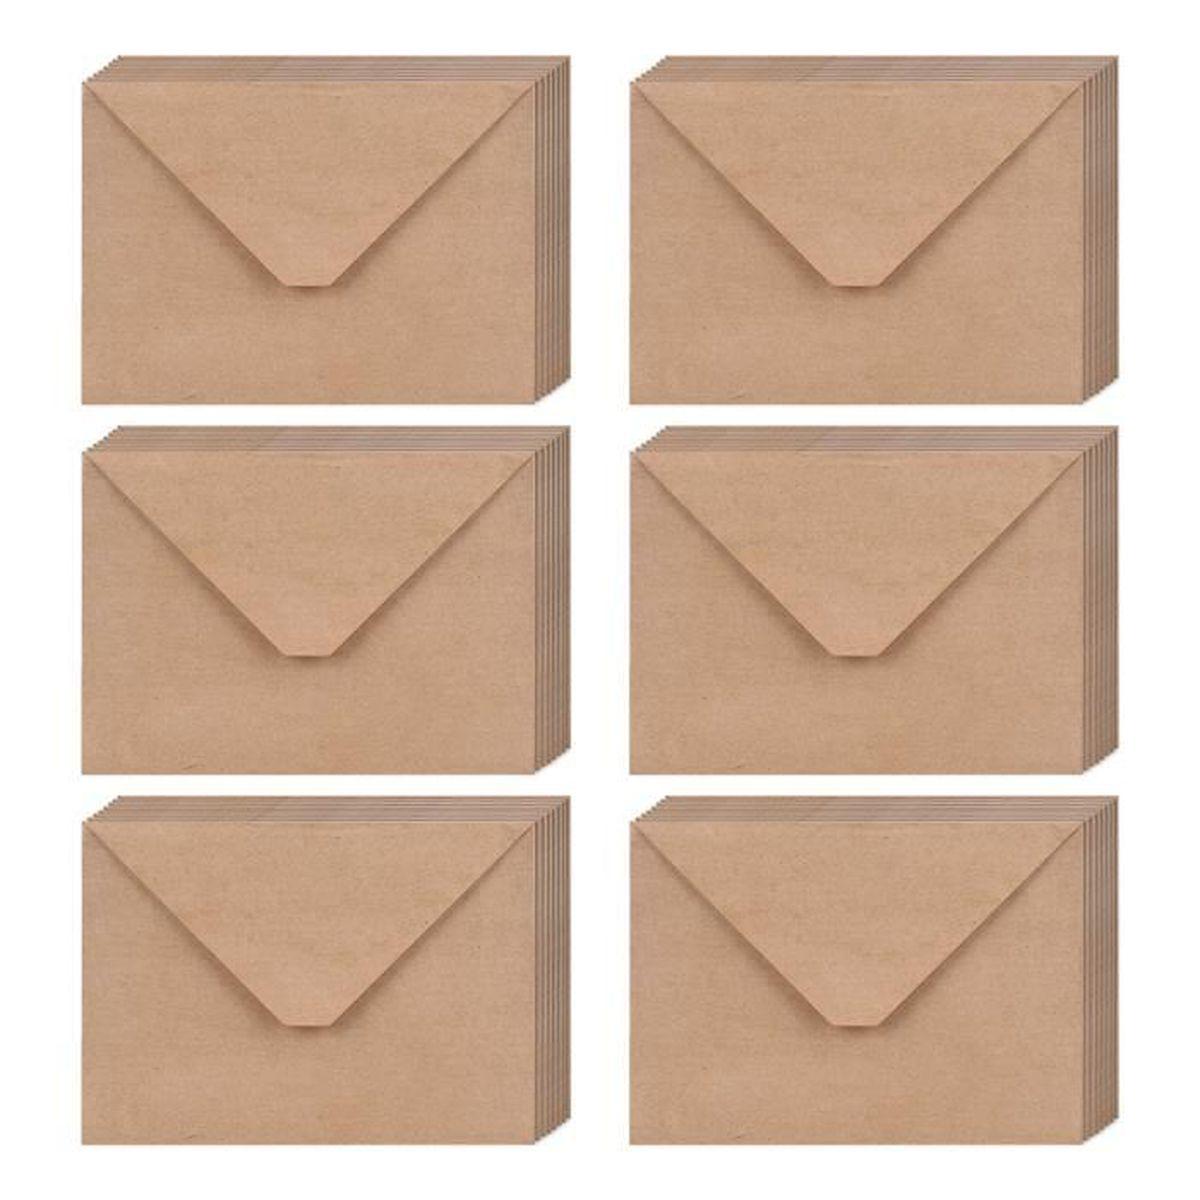 Vintage Wedding invitations stationnaire Sets avec enveloppes kraft-Packs De 20